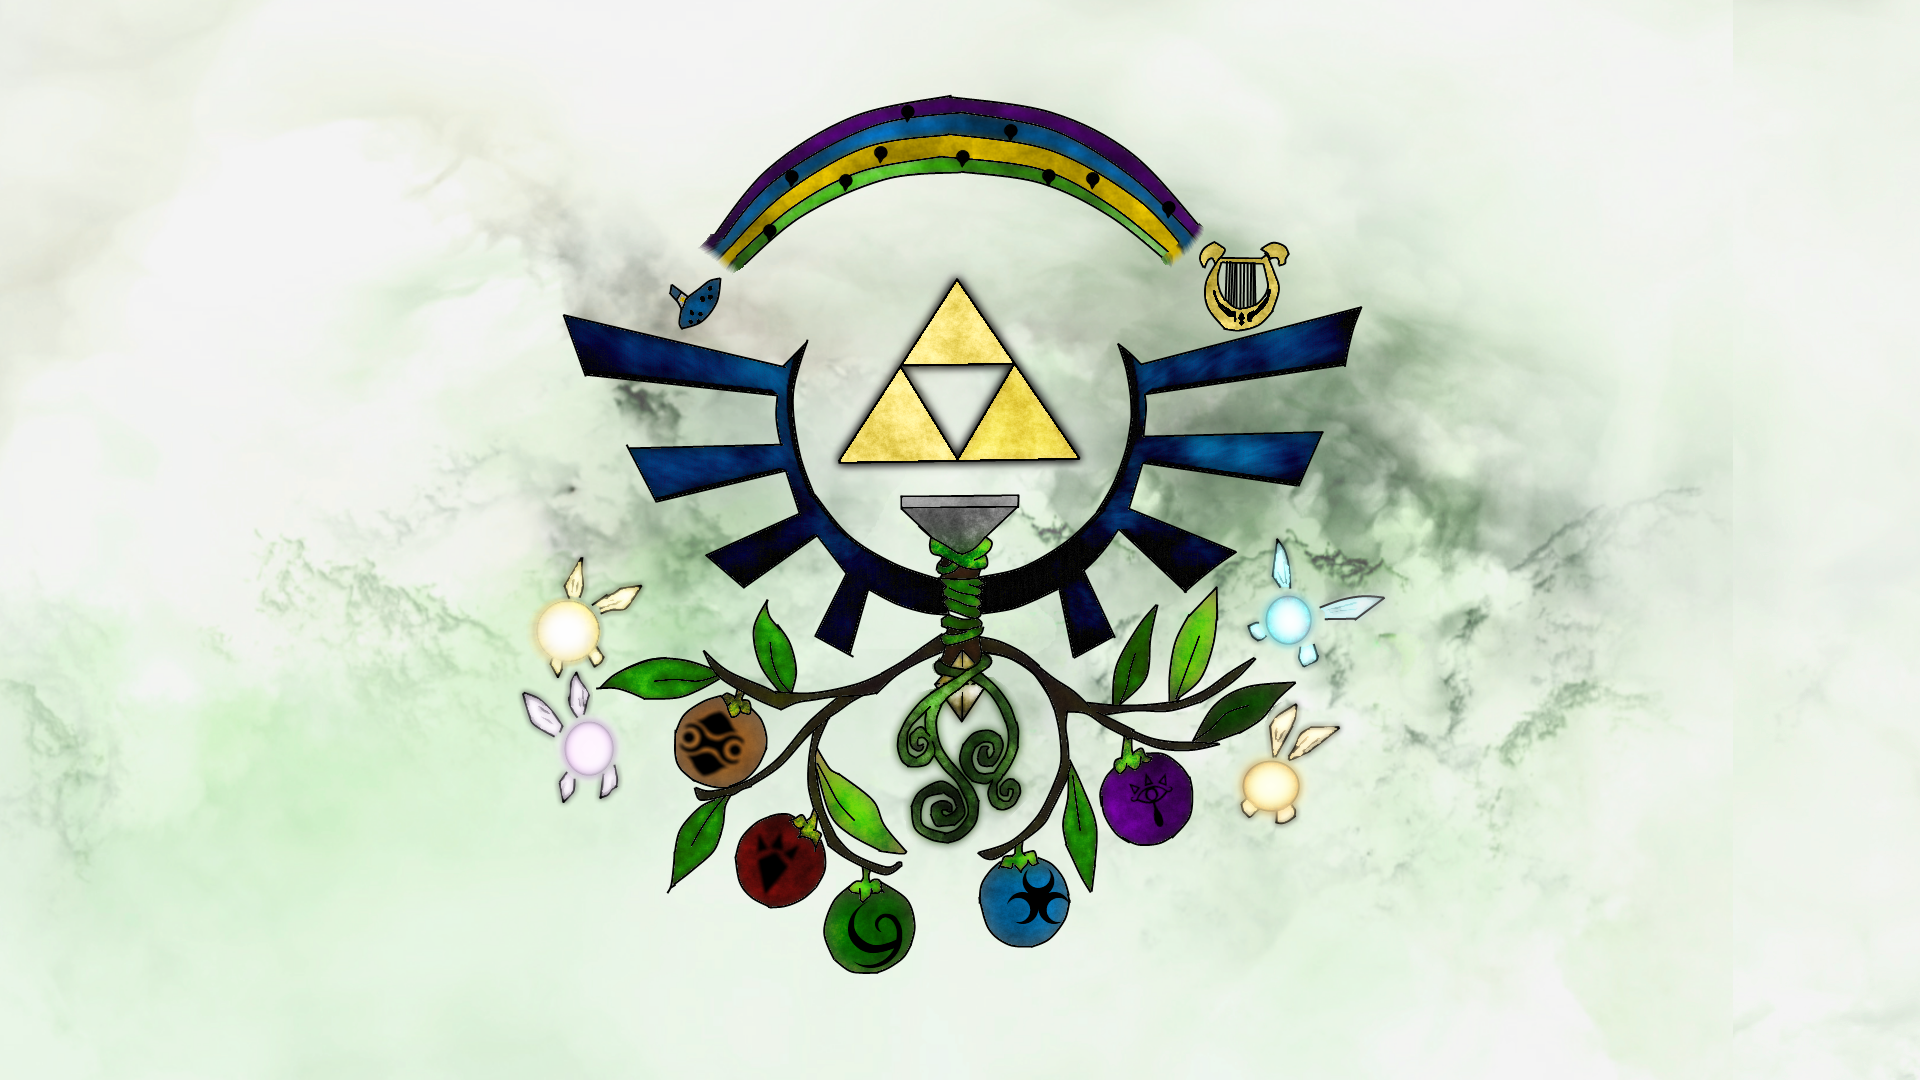 Zelda Wallpaper by SchadenZareude on DeviantArt